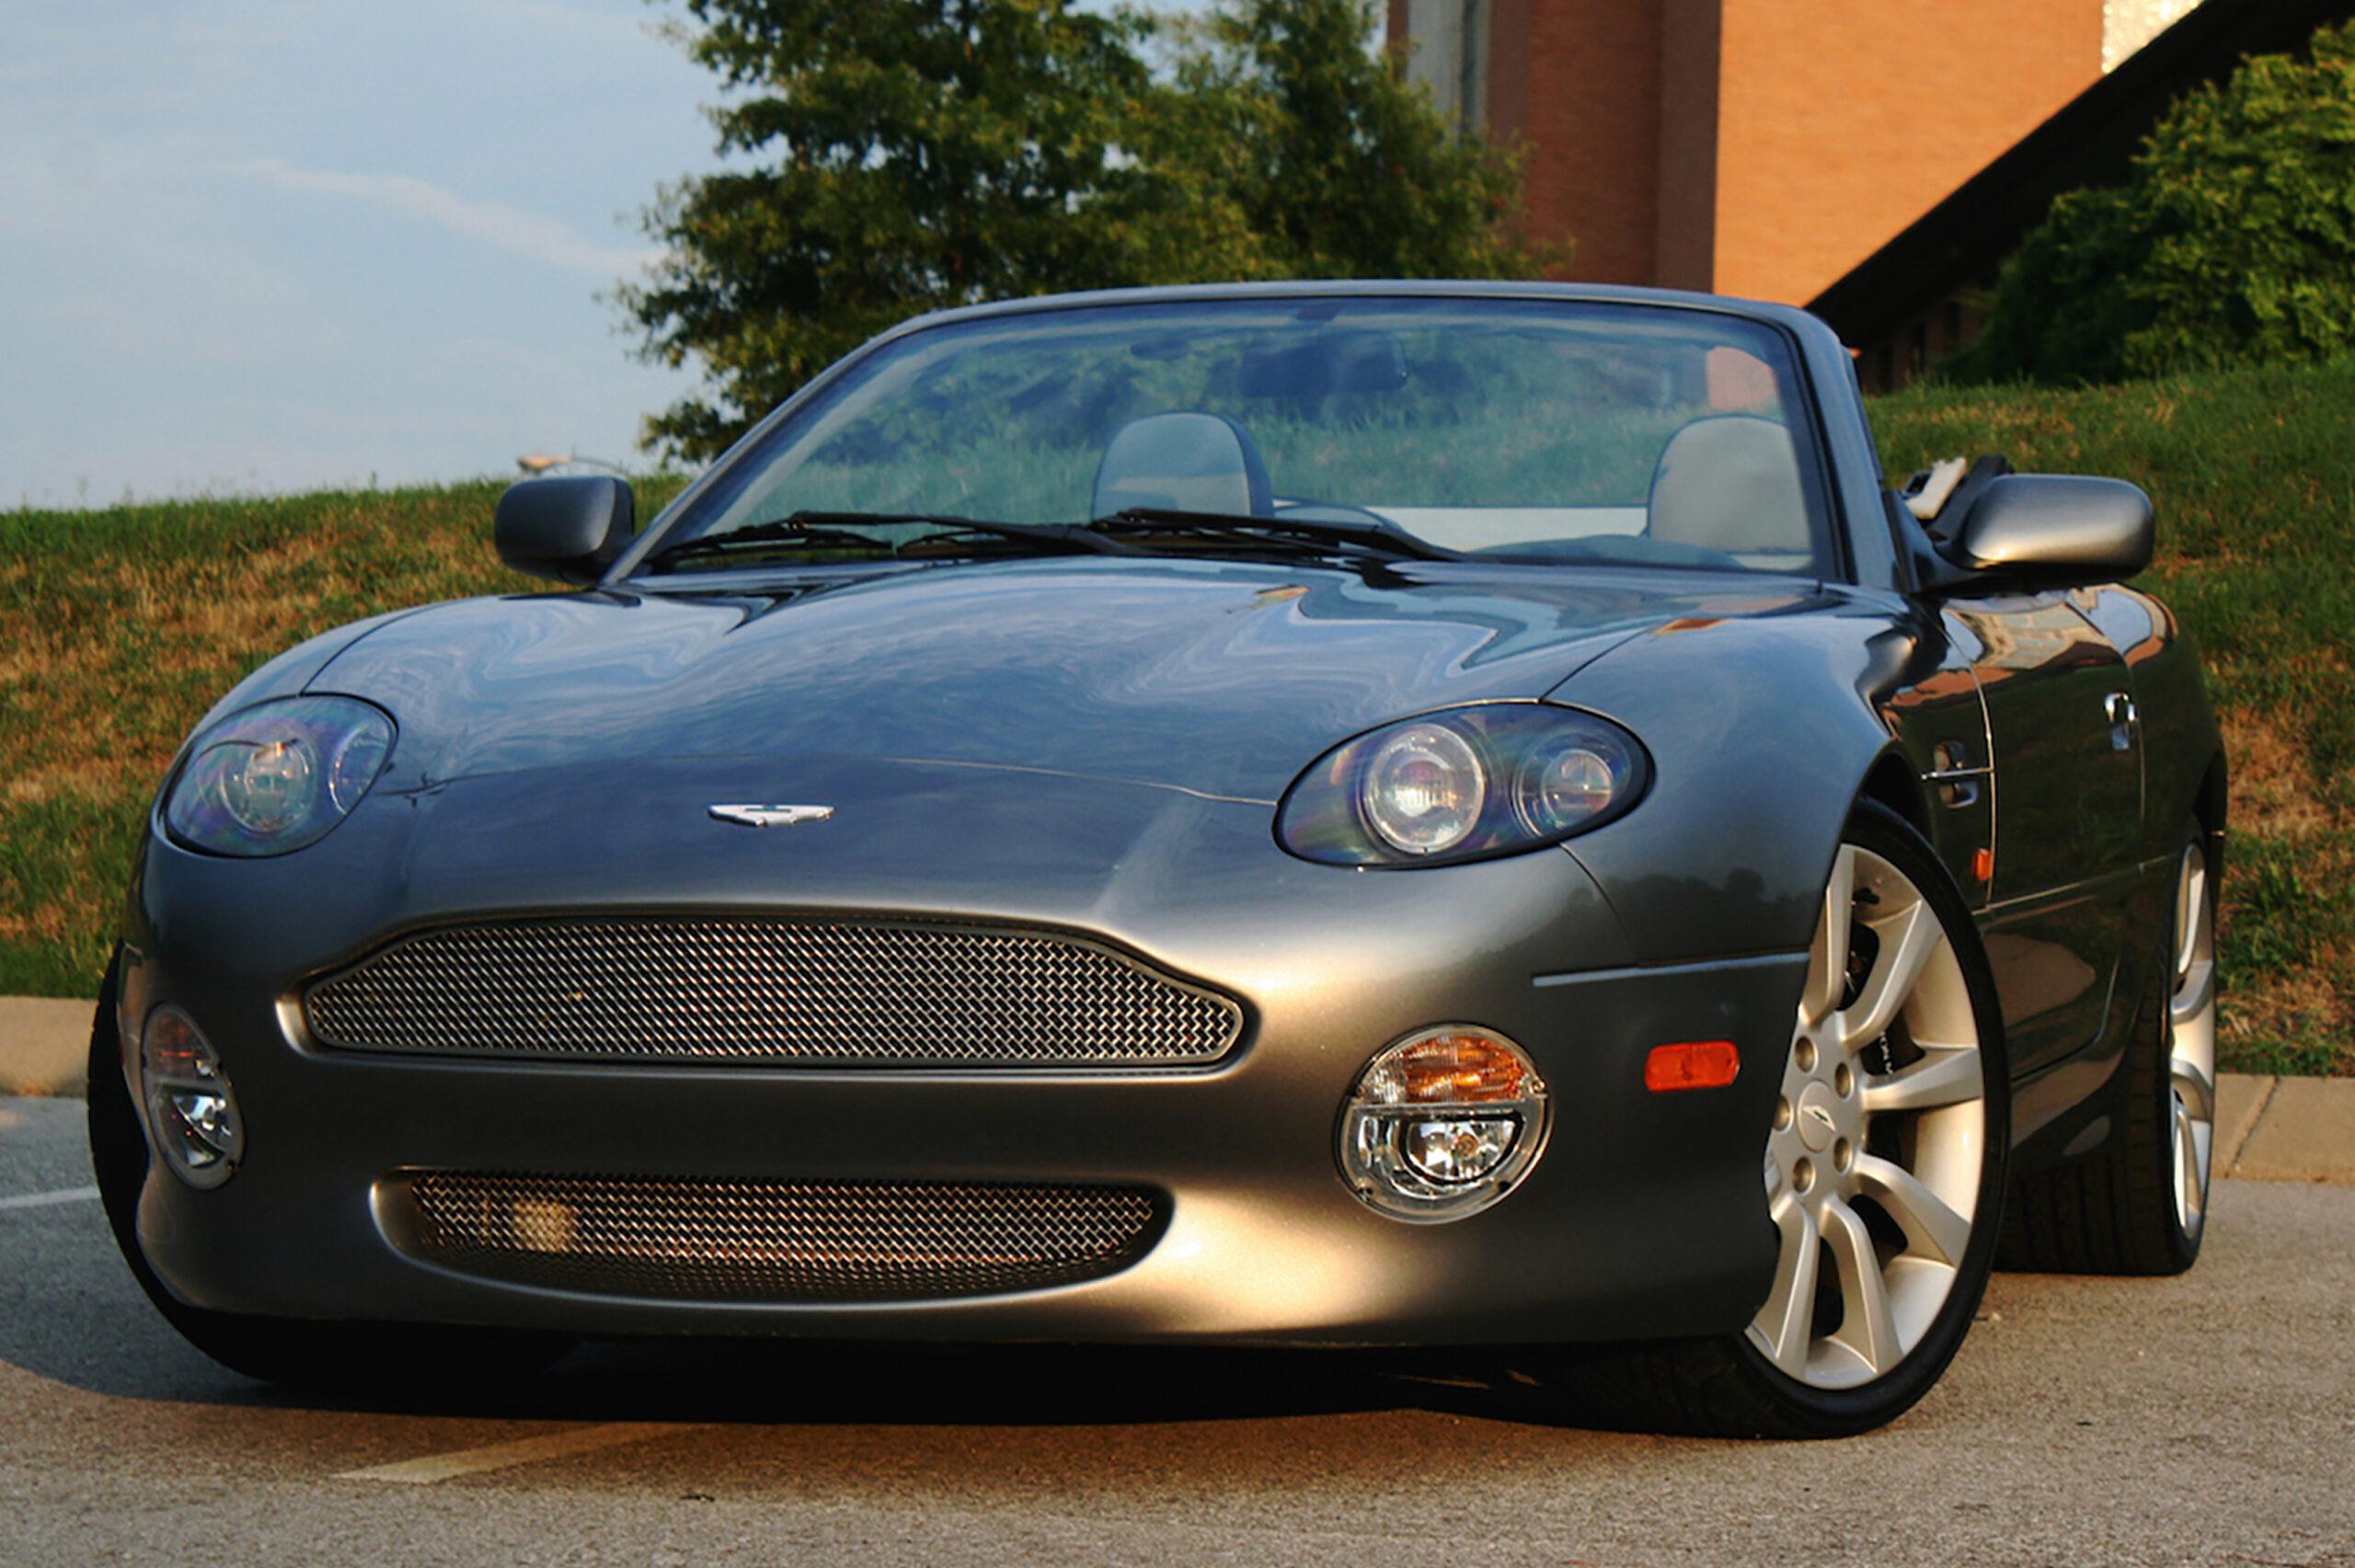 2002 Aston Martin Db7 Zombdrive